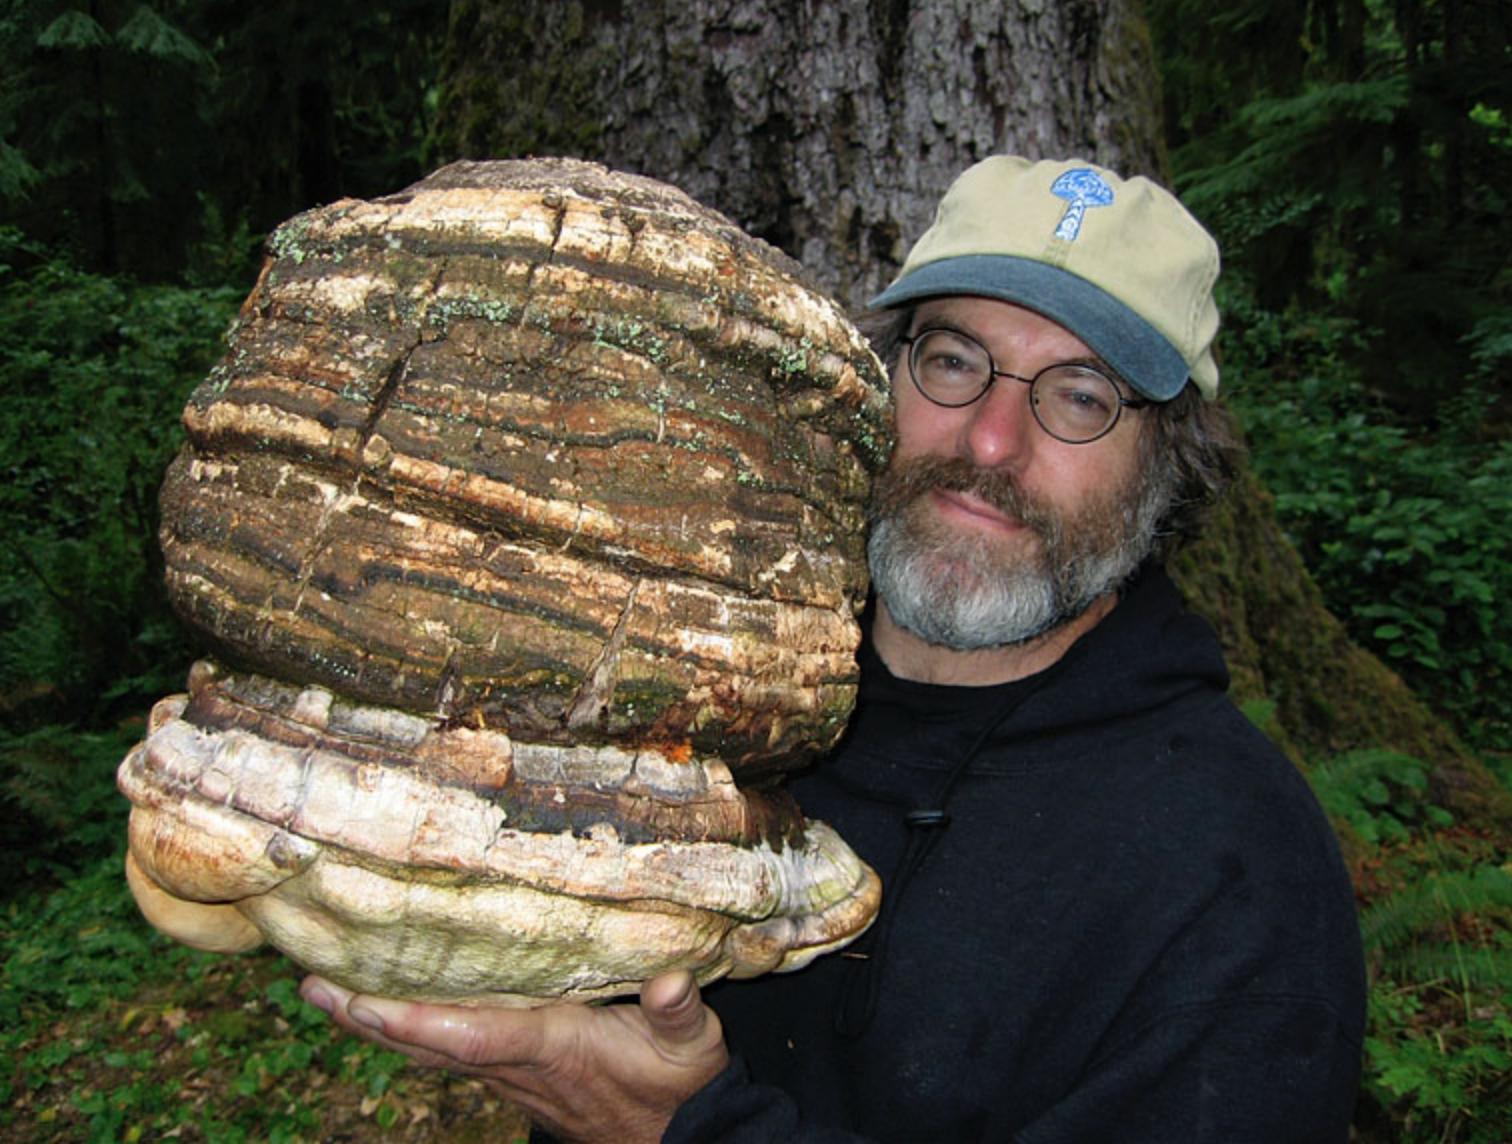 Paul Stamets, American mycologist holding an Agarikon mushroom.